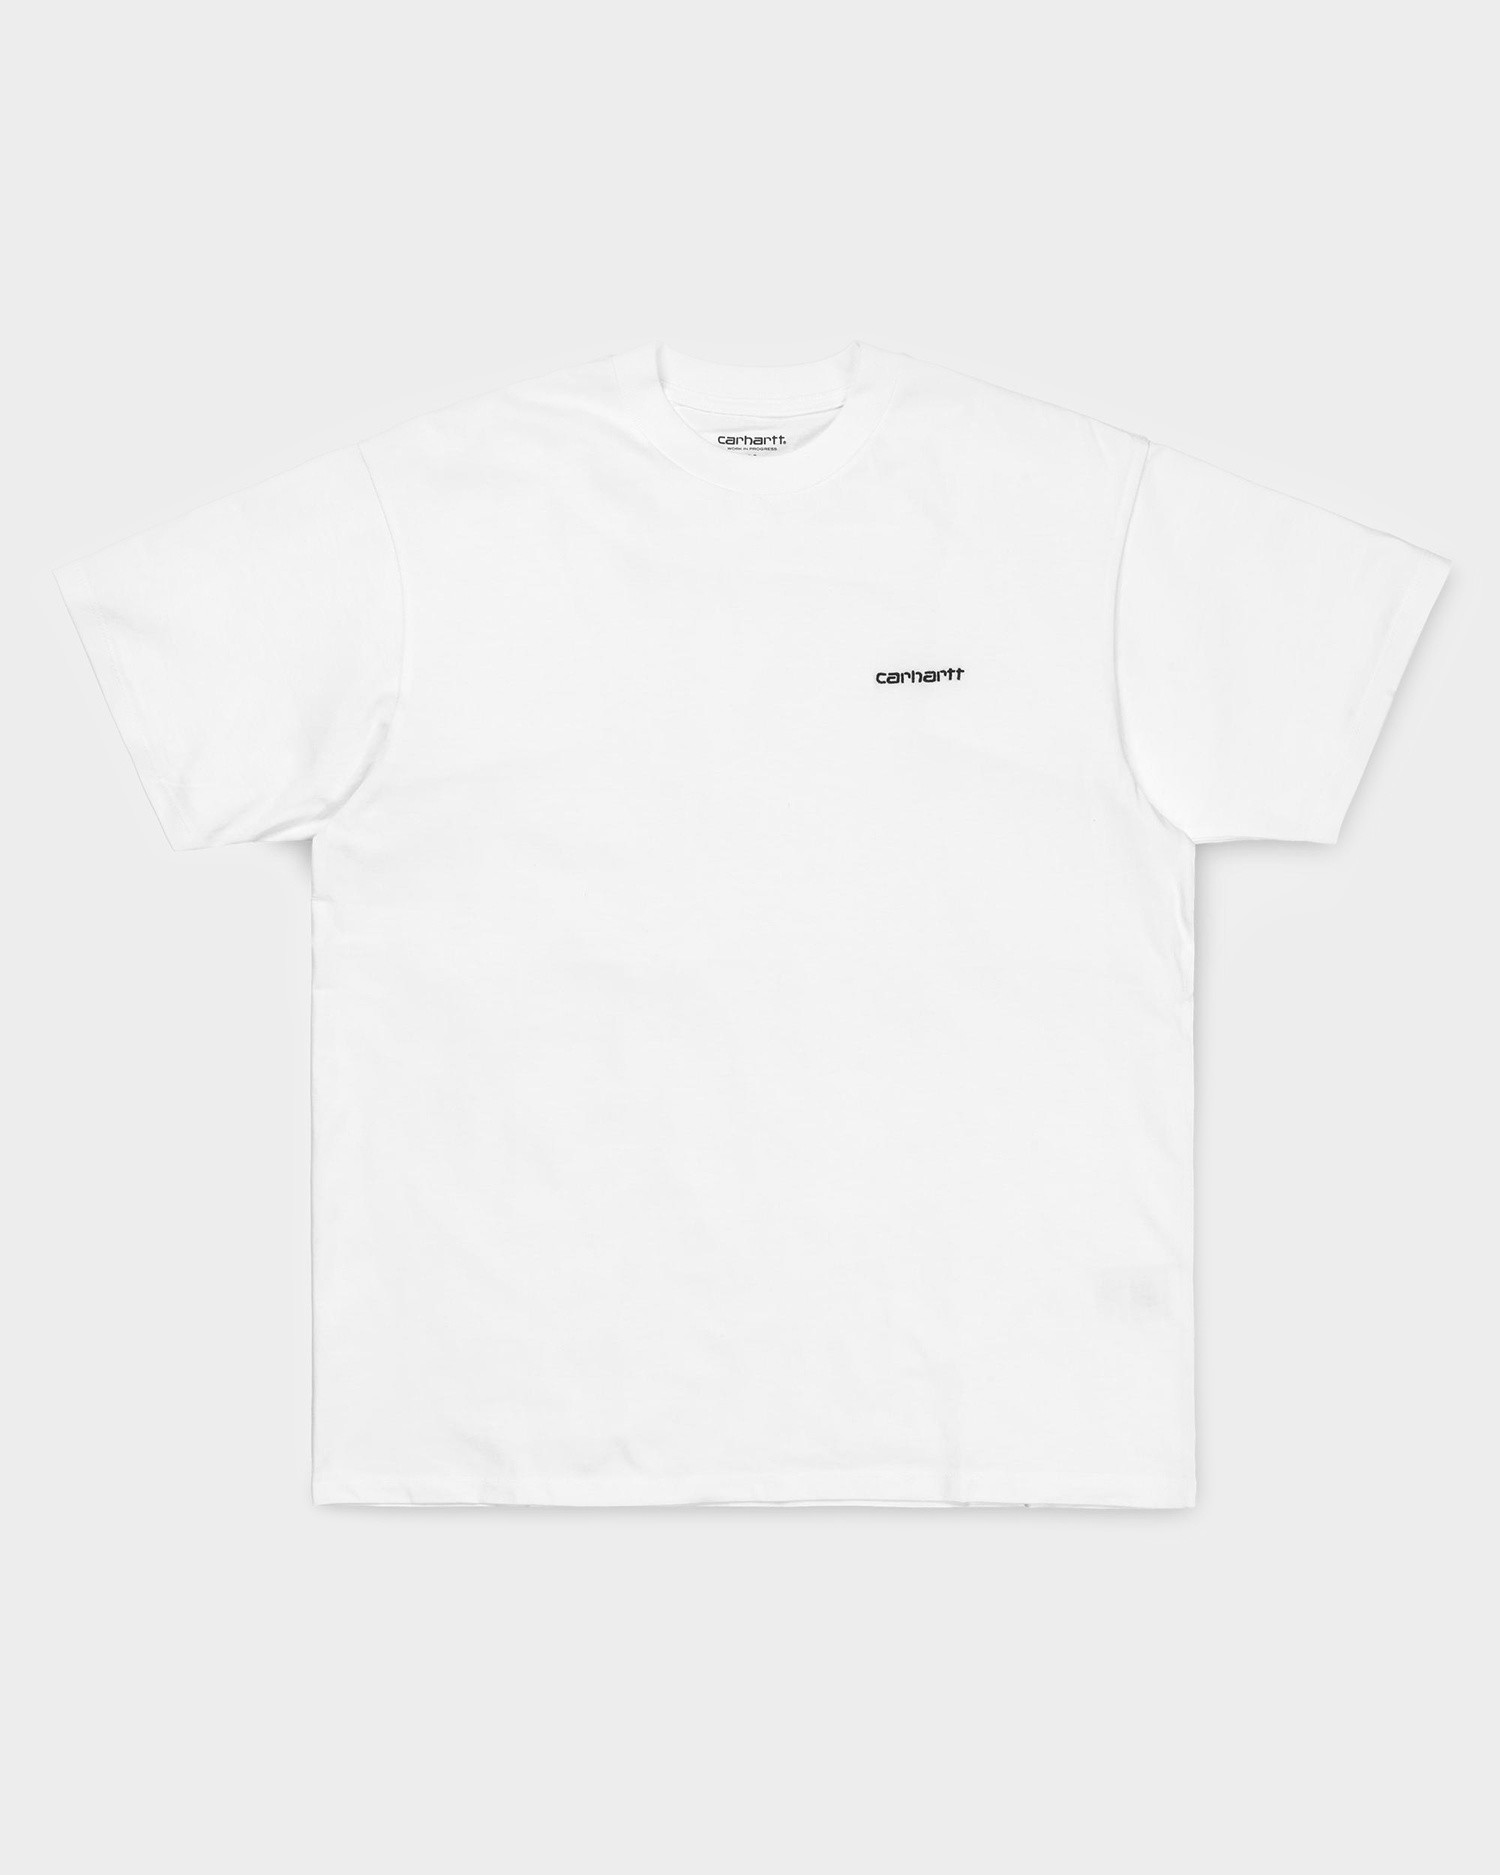 Carhartt Shortsleeve Script Embroidery T-Shirt White/Black